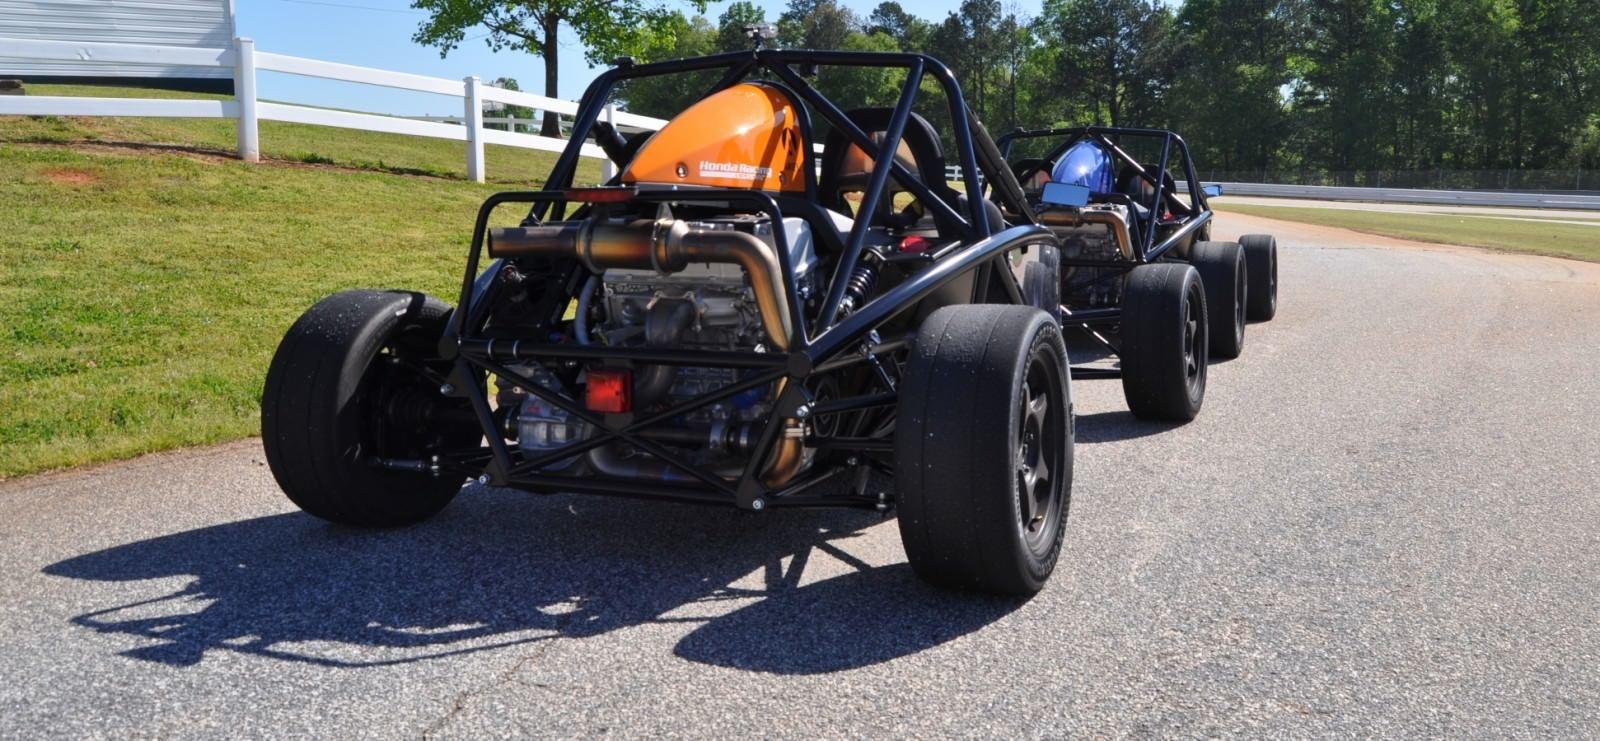 Ariel Atom Duo on Slicks at the Road Atlanta Skidpad for ATL Driving Experience 17